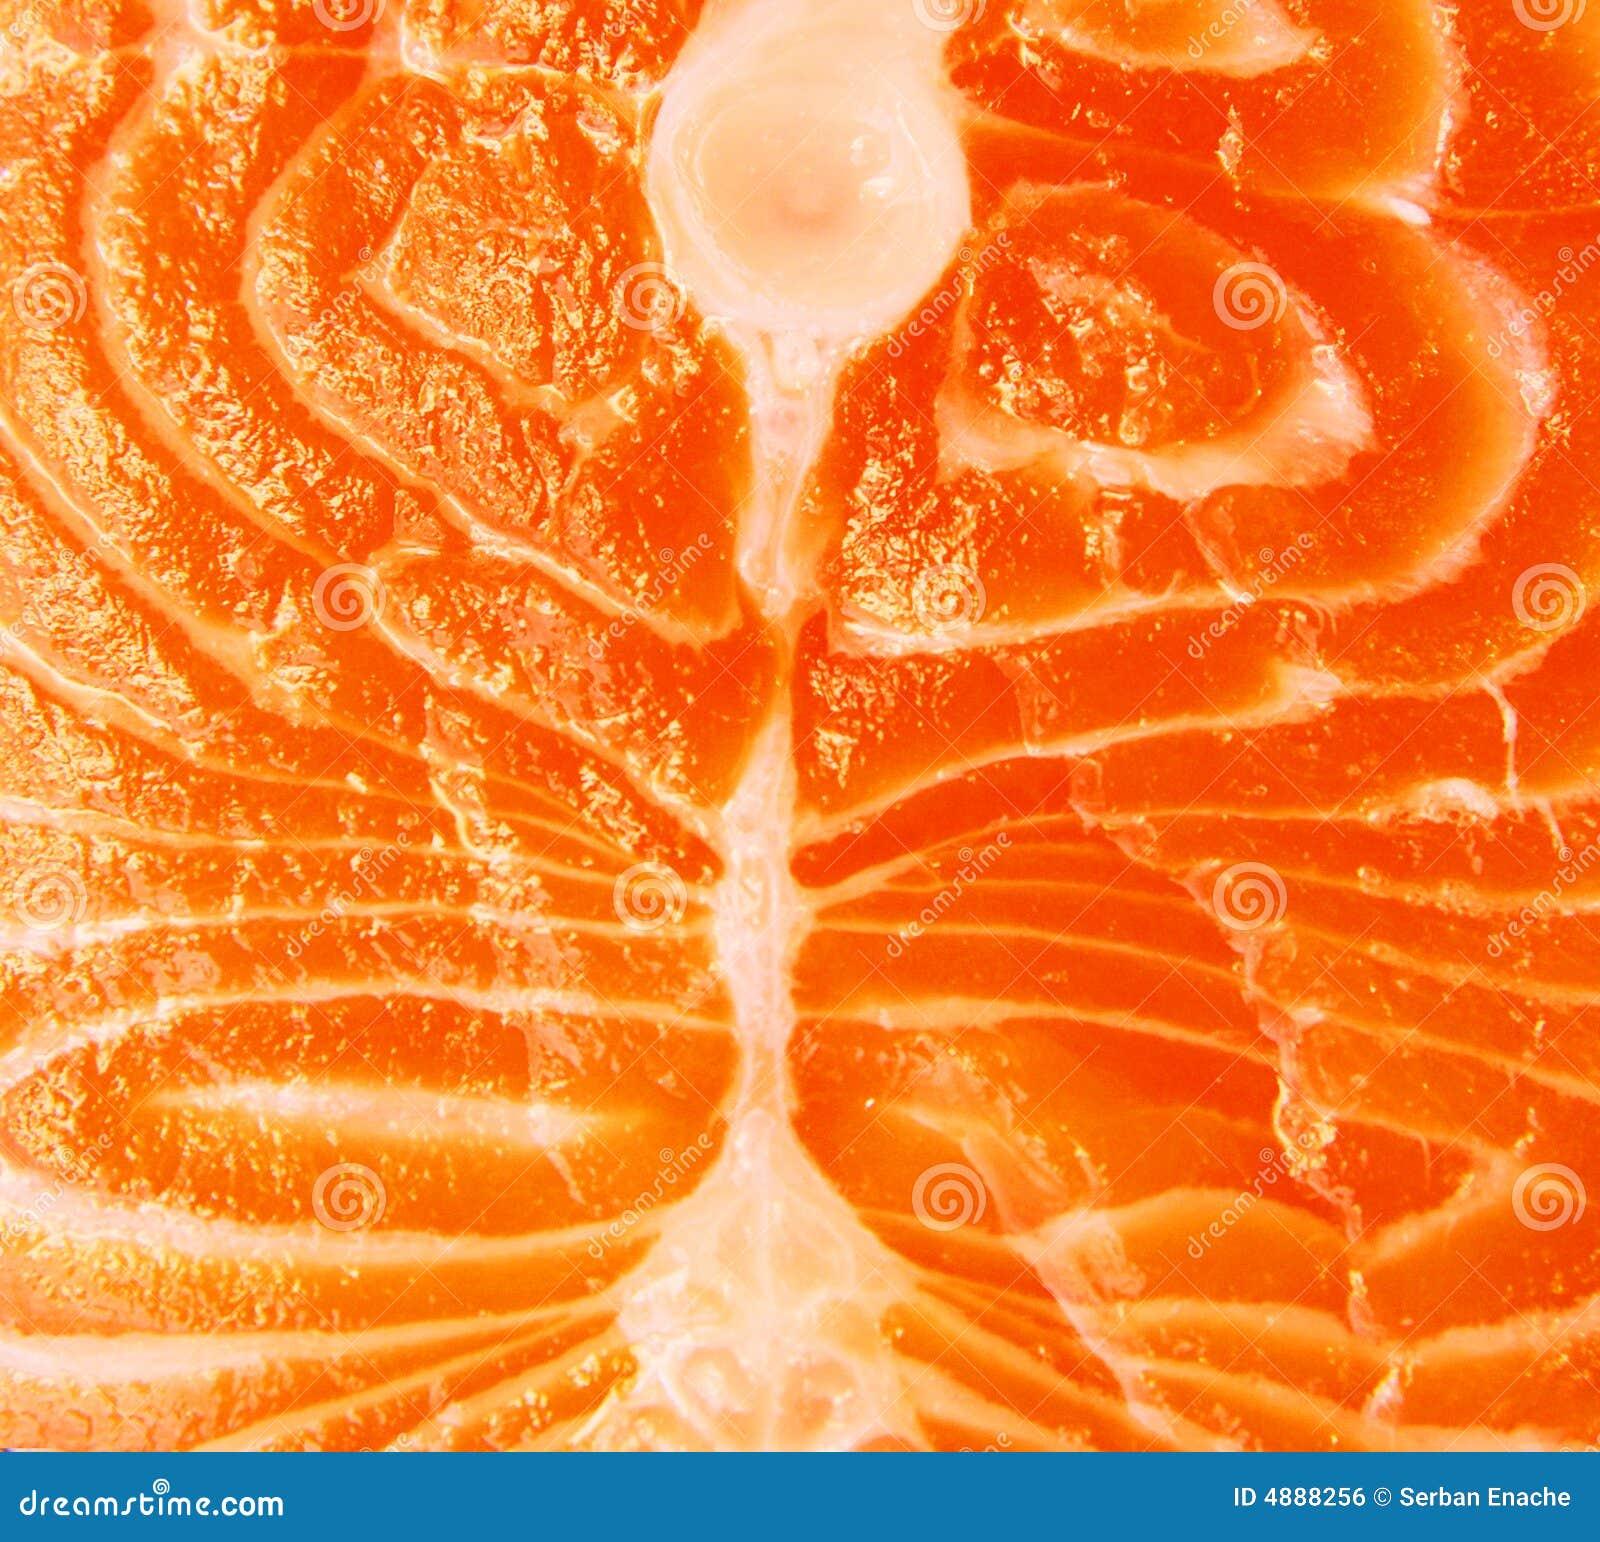 Closeup of salmon meat